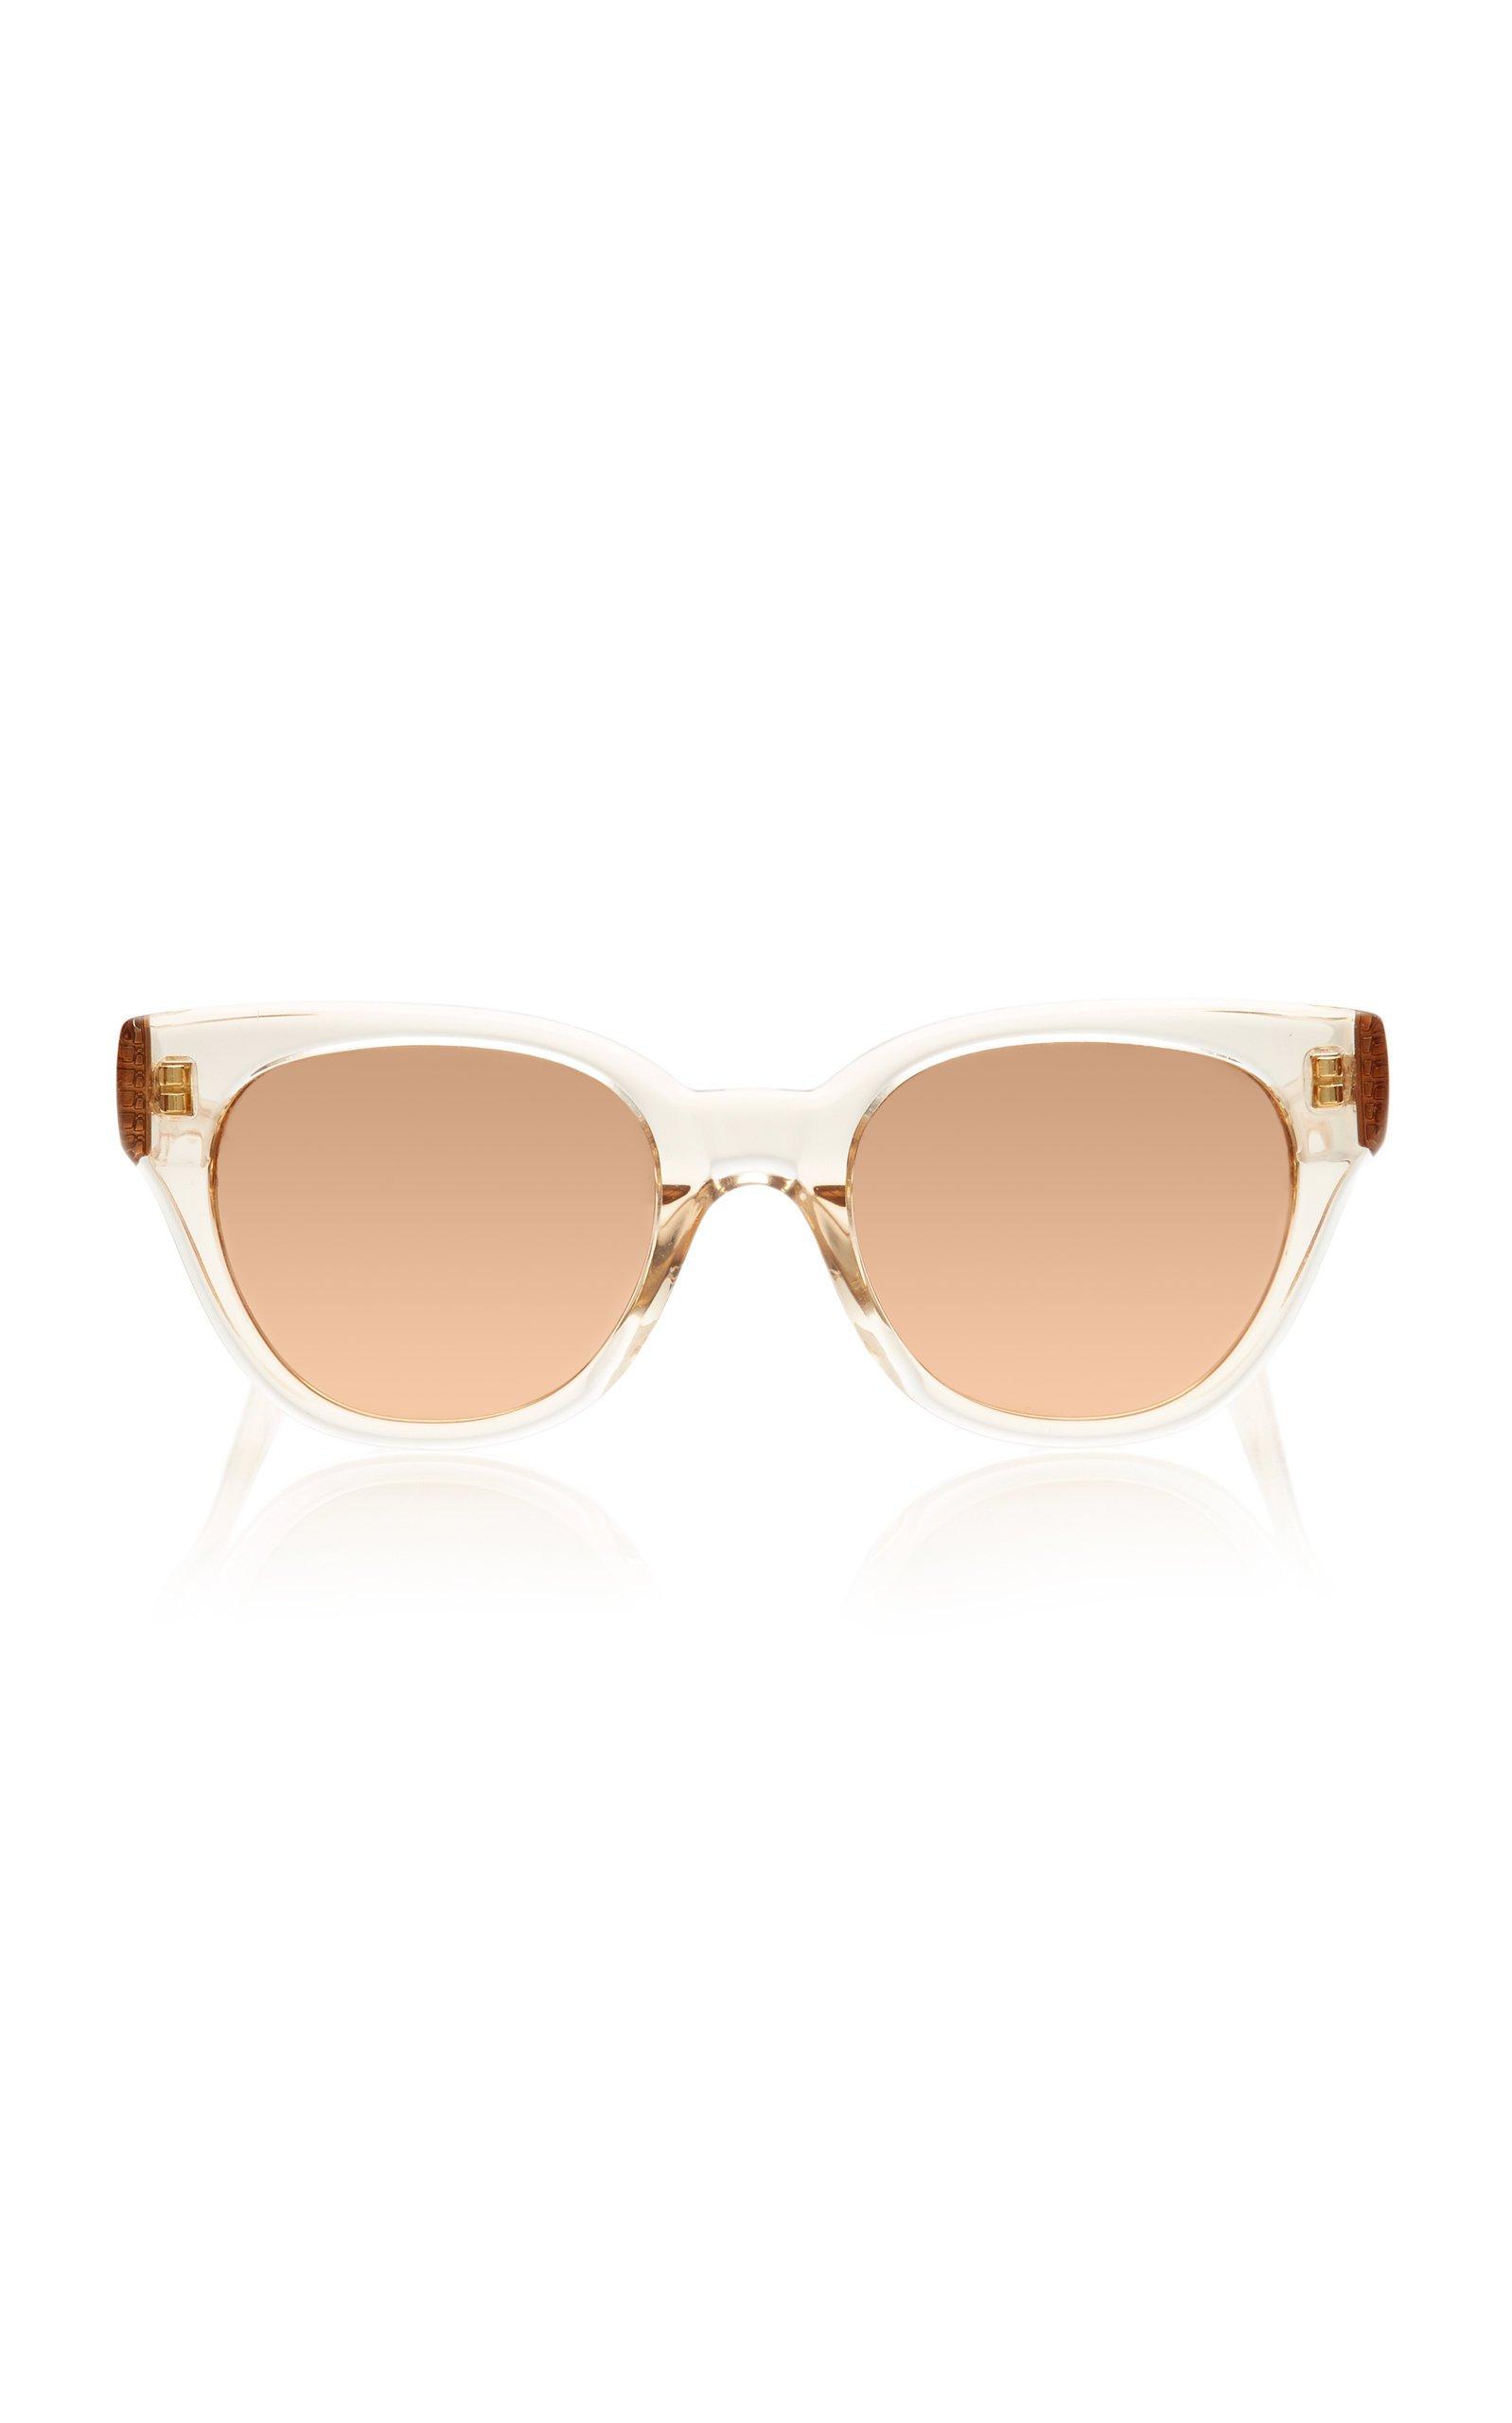 Linda Farrow Rose-Gold Acetate Sunglasses